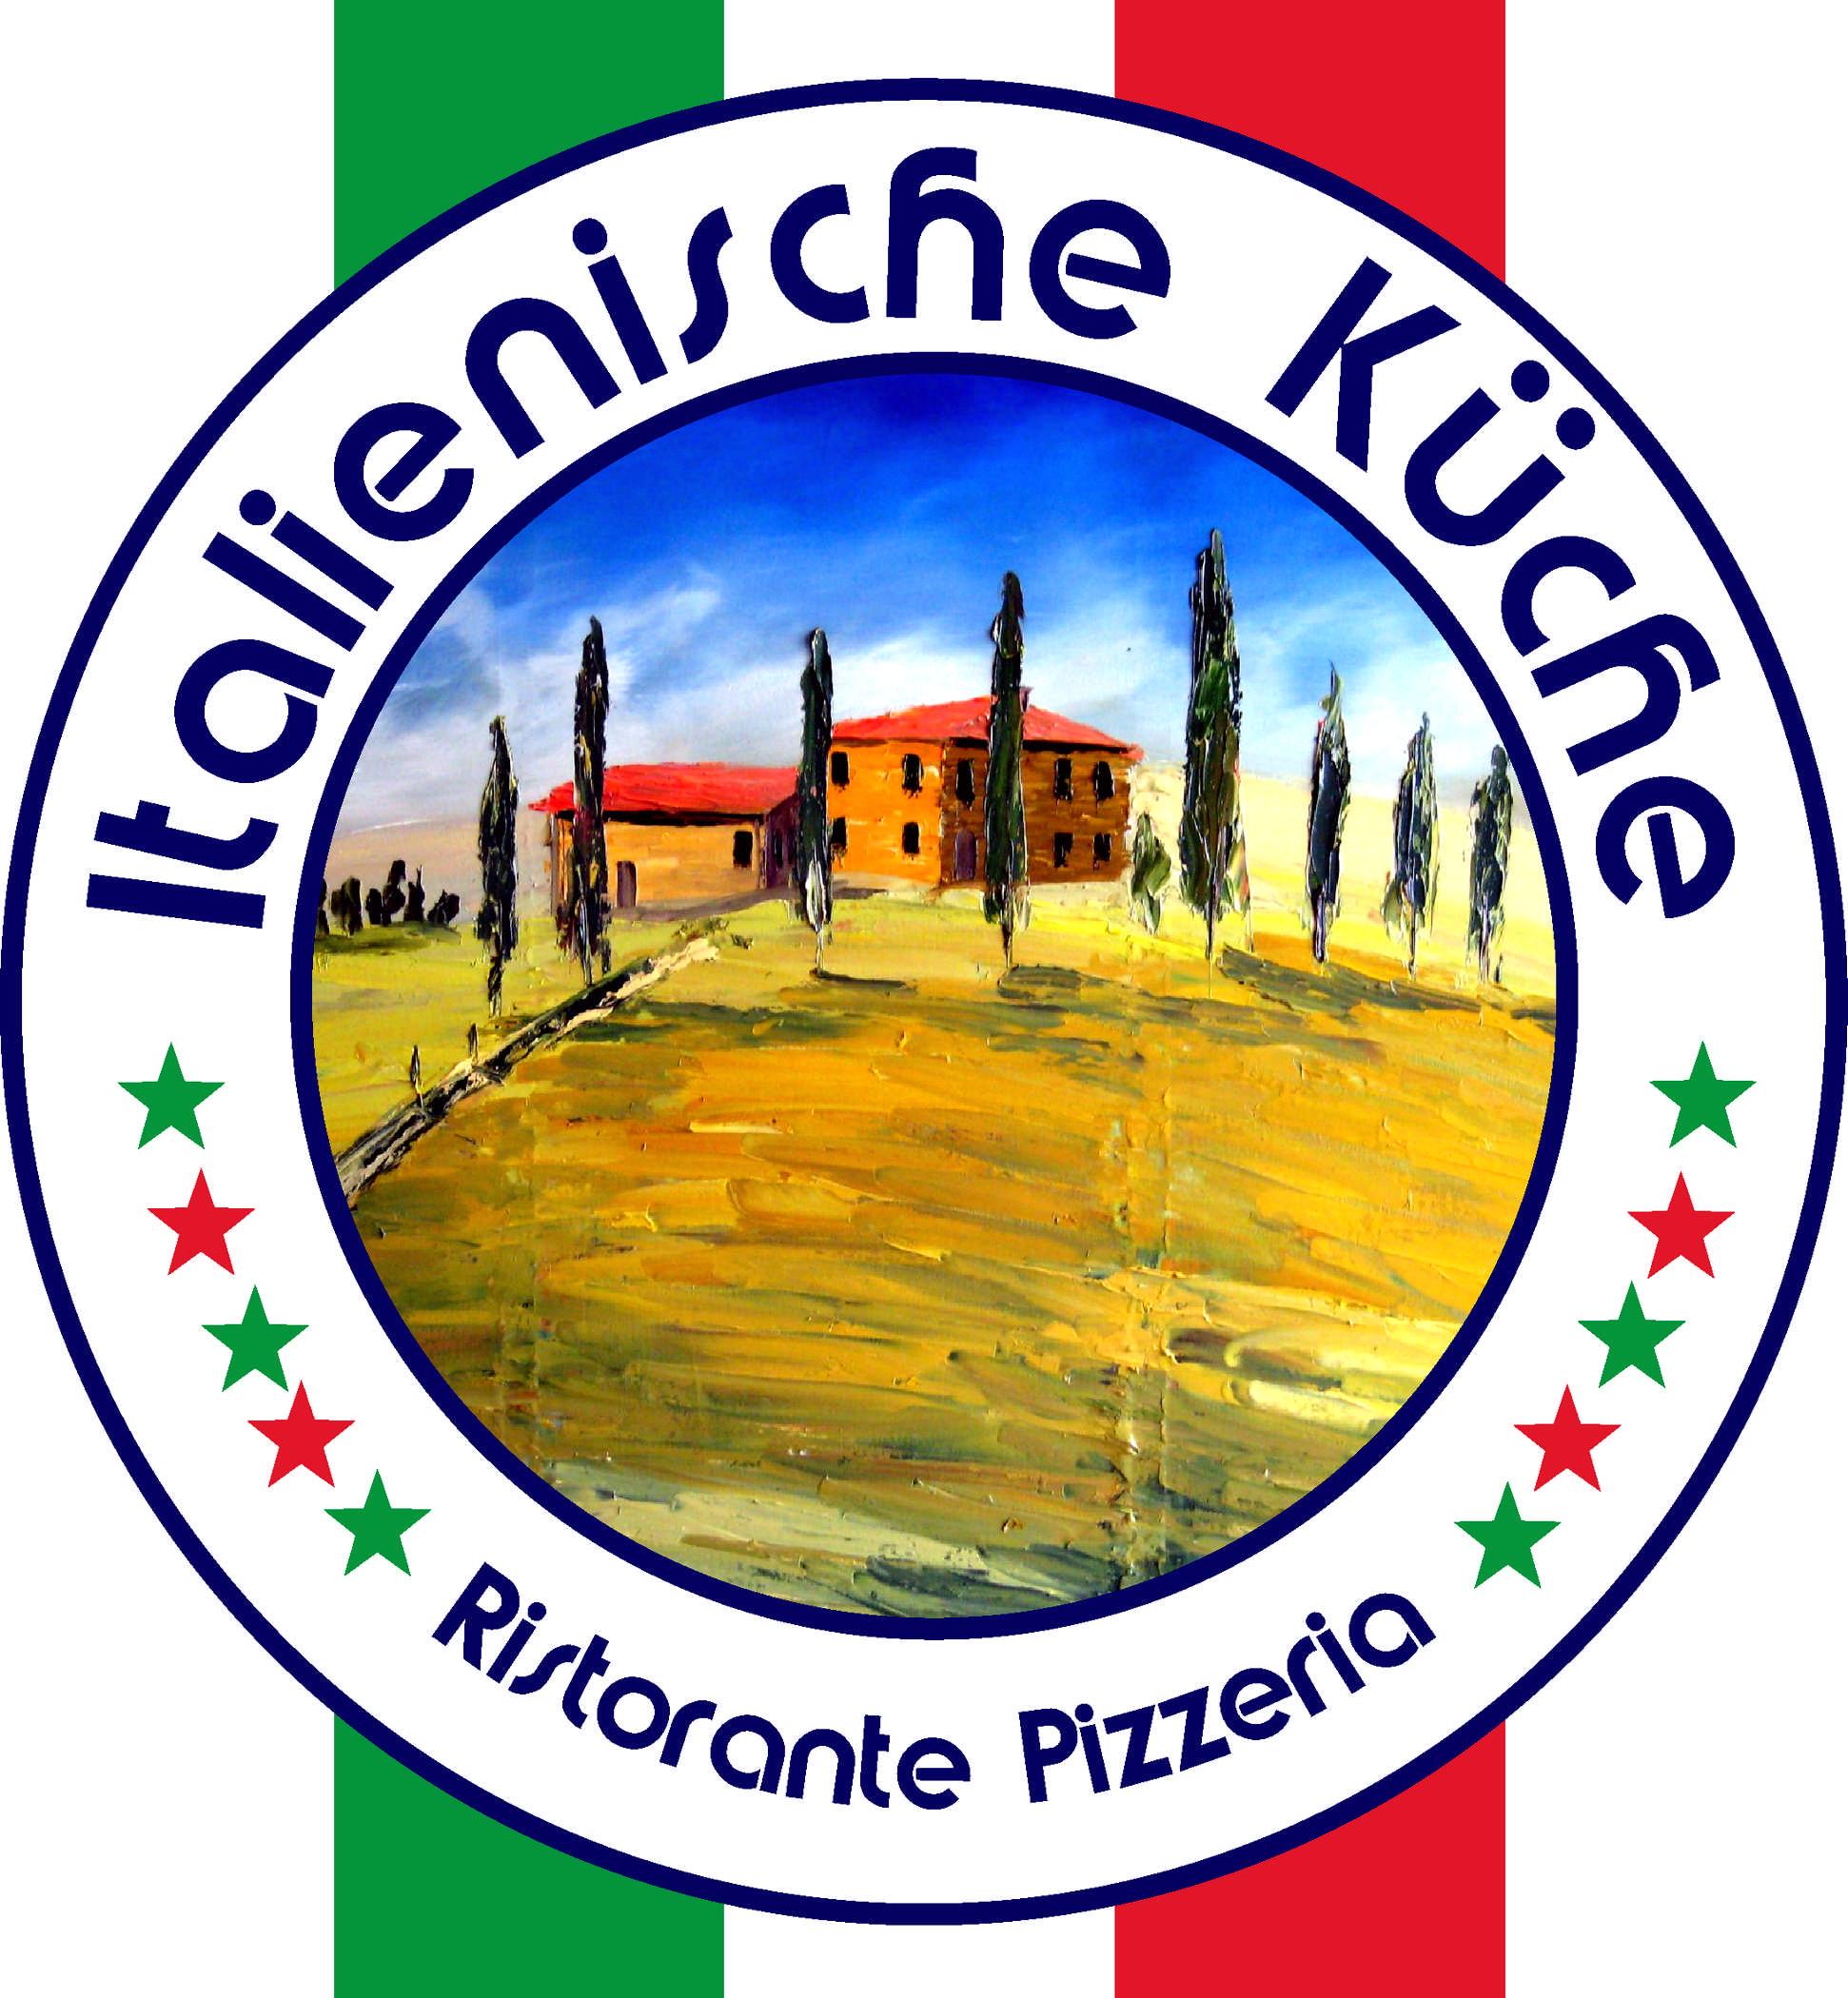 Logo Italienische Küche Ristorante Pizzeria Toscana Dipinto toscany ...